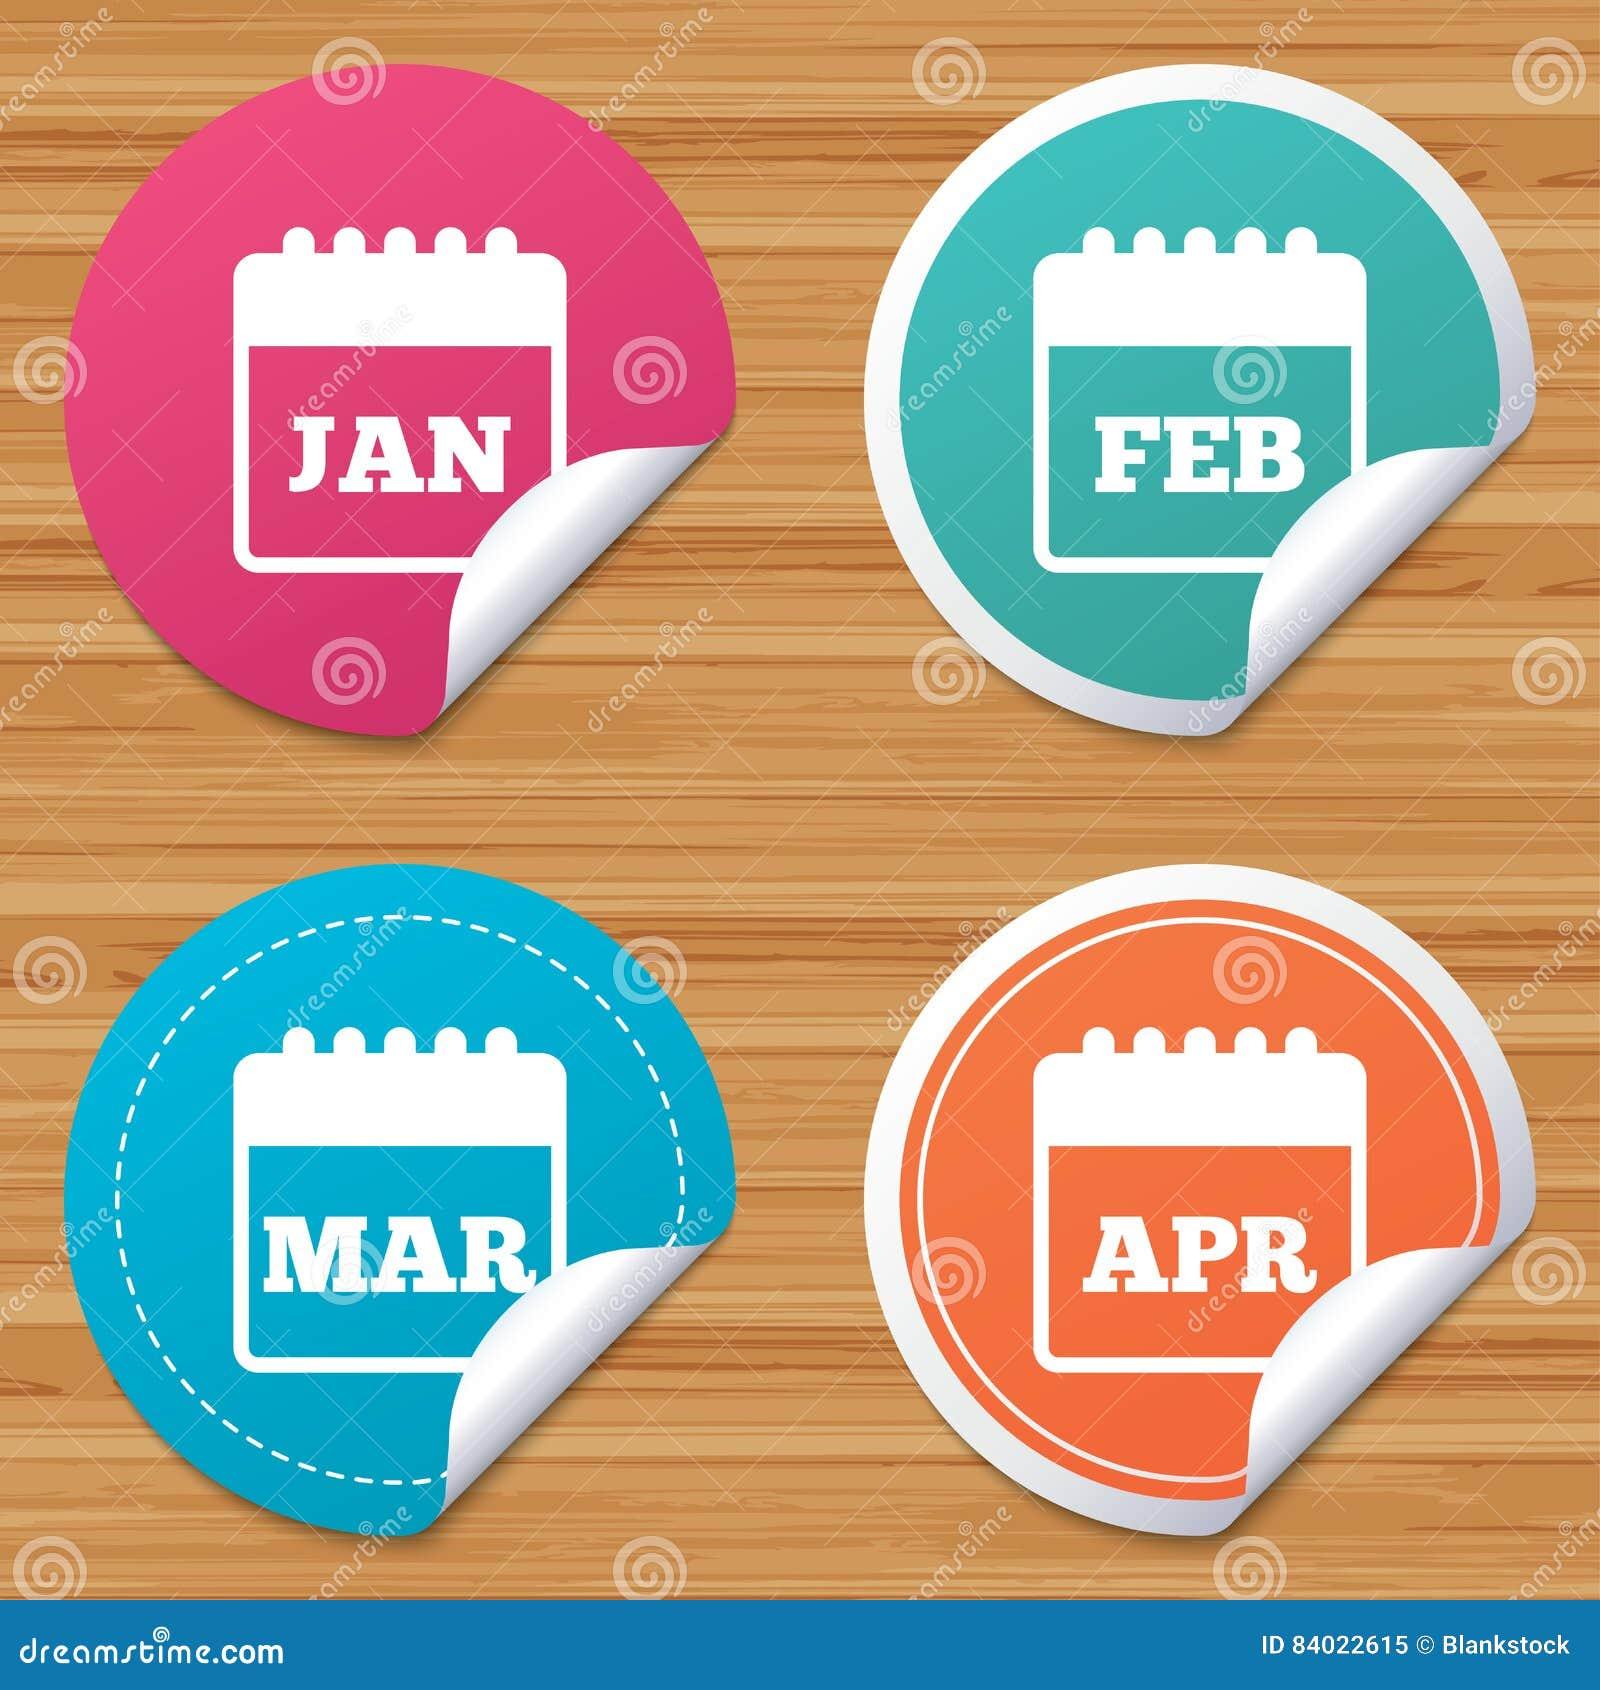 Dating site symbols